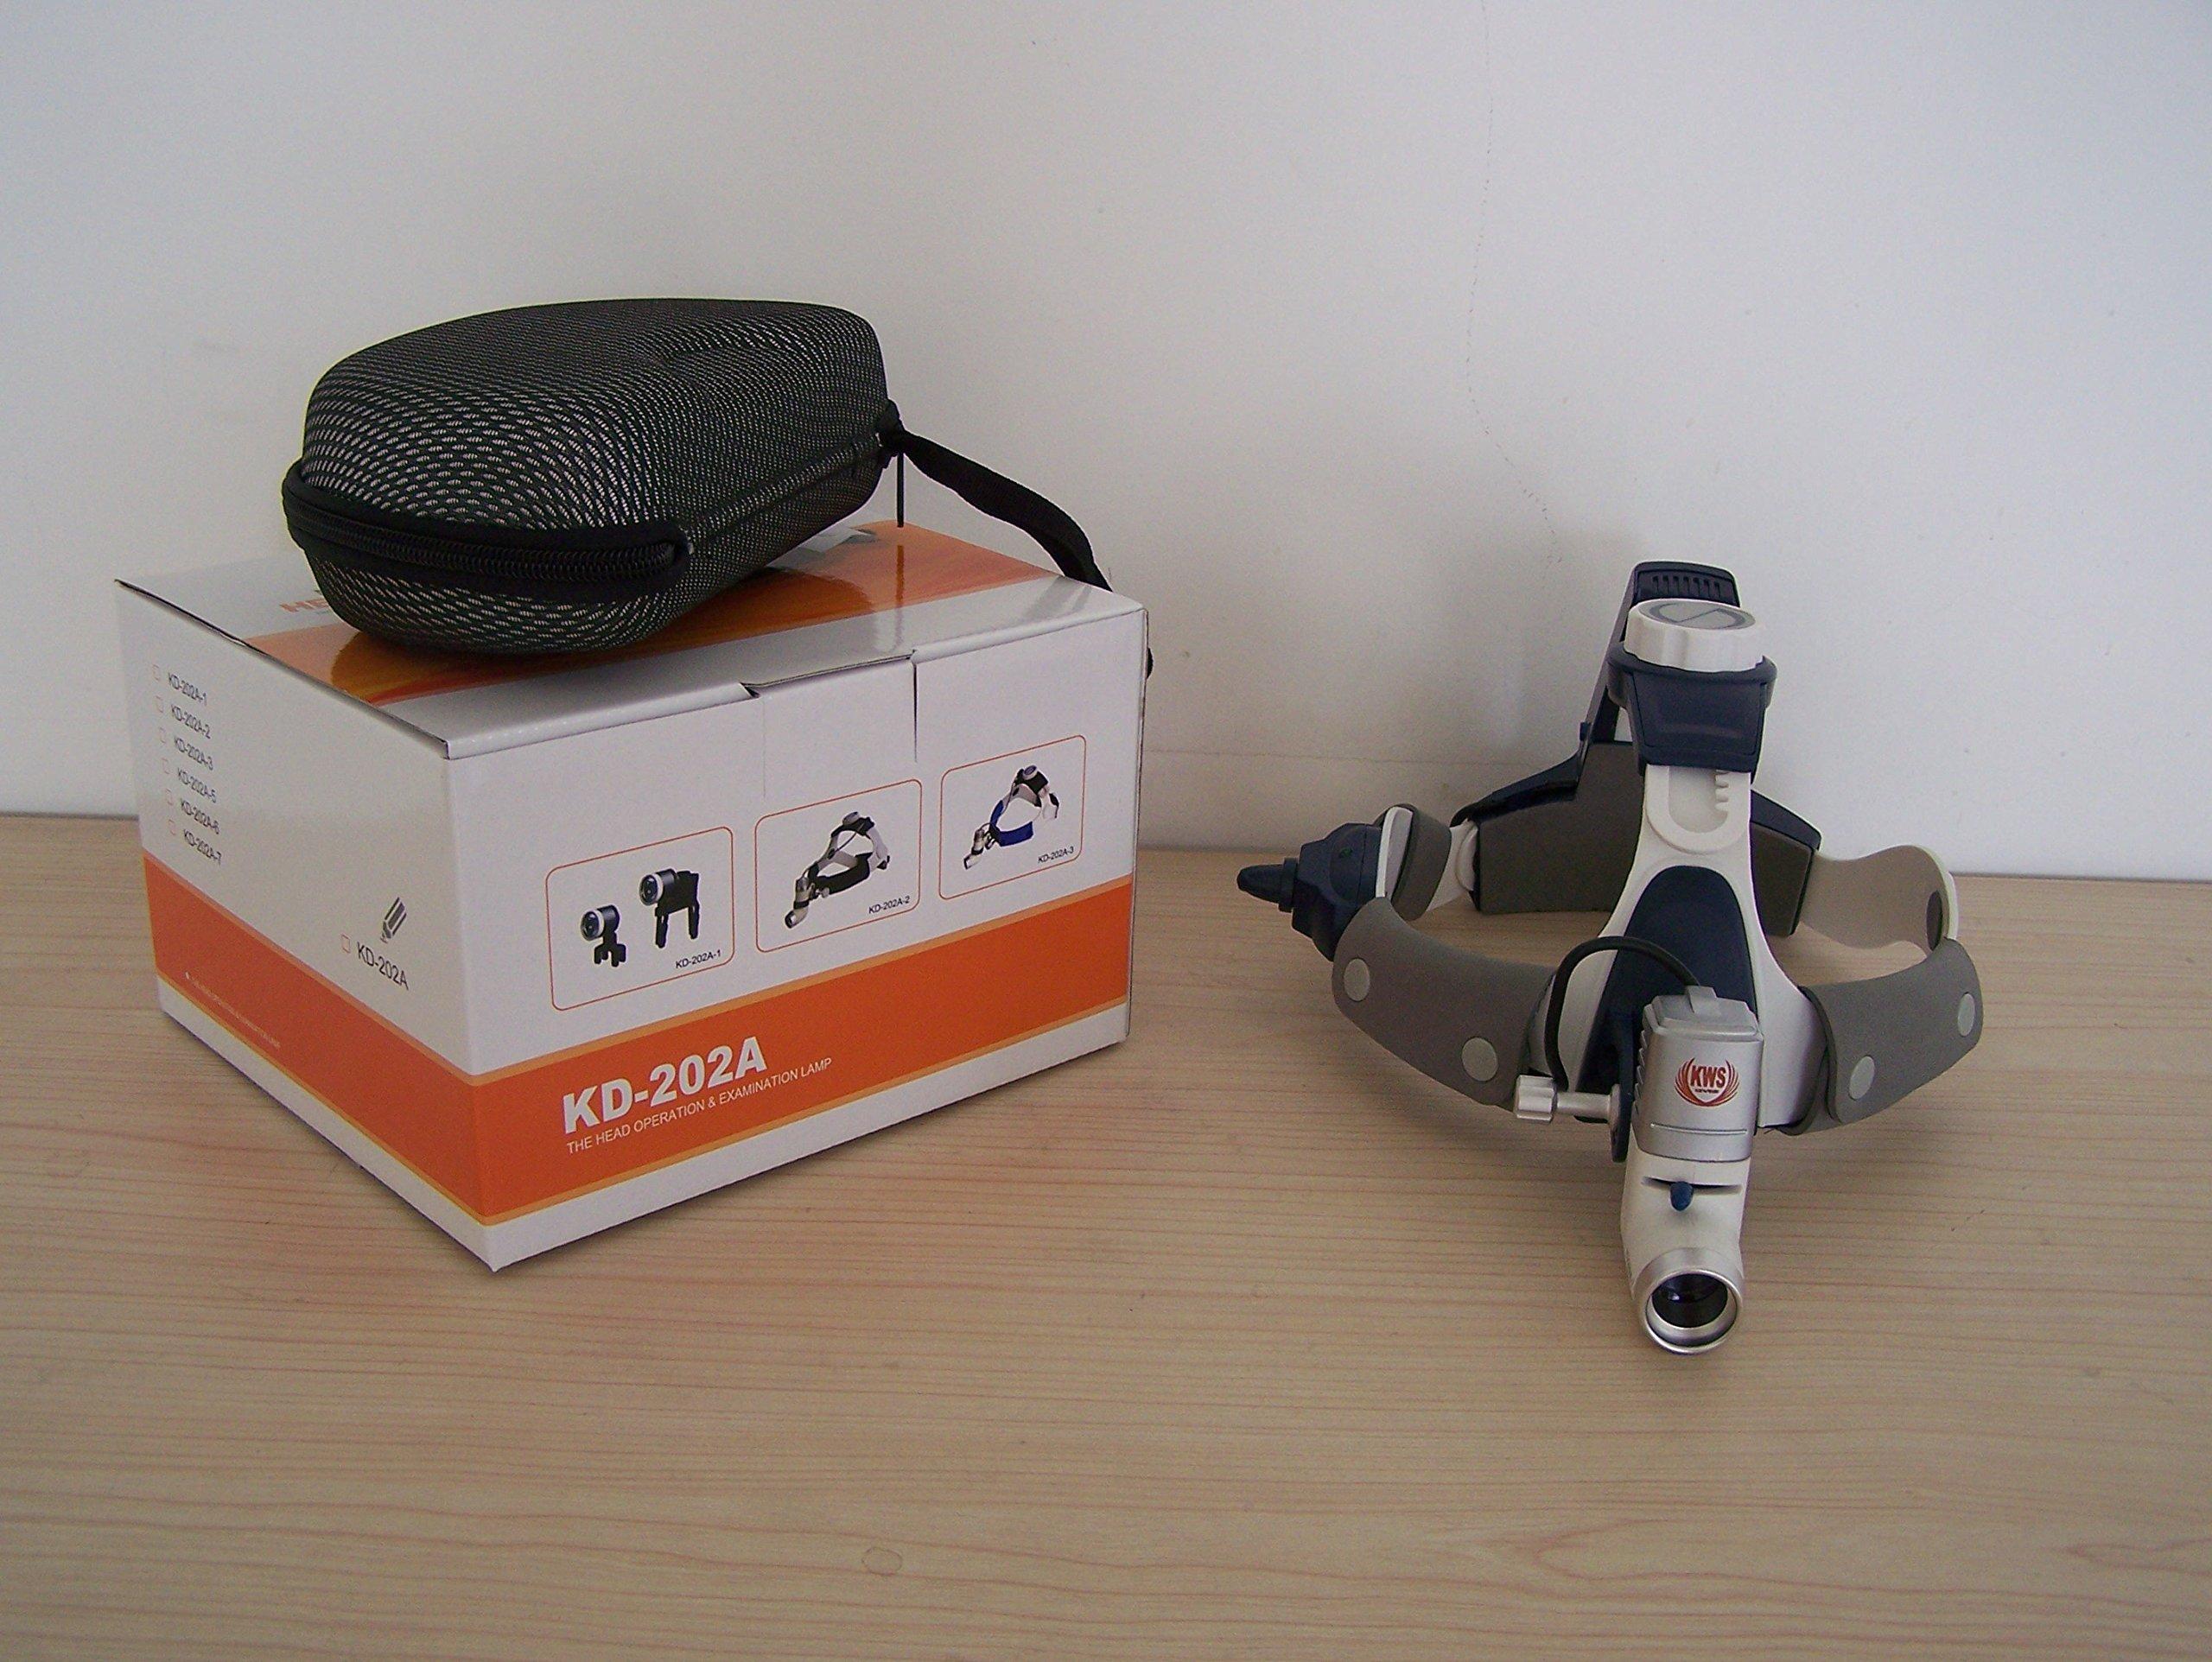 NSKI Dental 3.5X420mm Surgical Binocular Loupes FD-502G + 5W LED Headlight KD202A-7 Headband Stlye